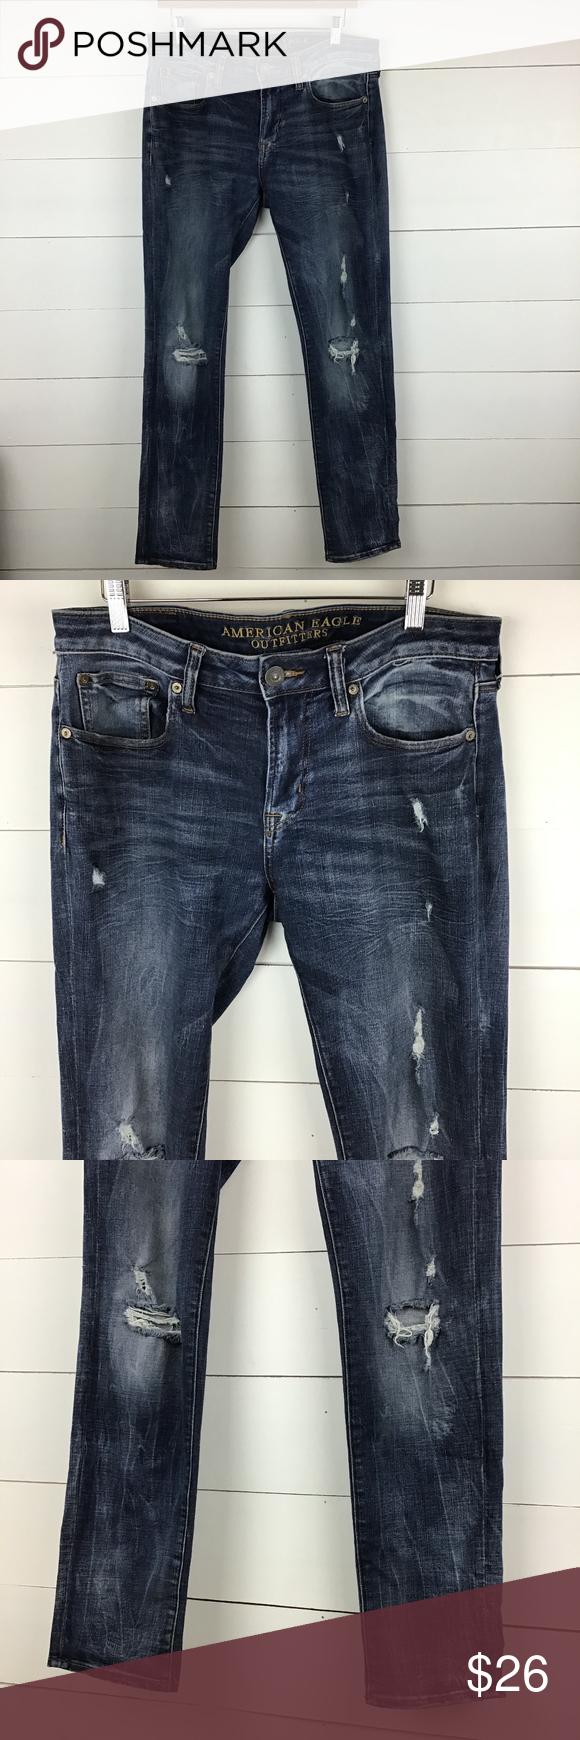 American Eagle Slim Straight Jeans sz: 34 in 2020